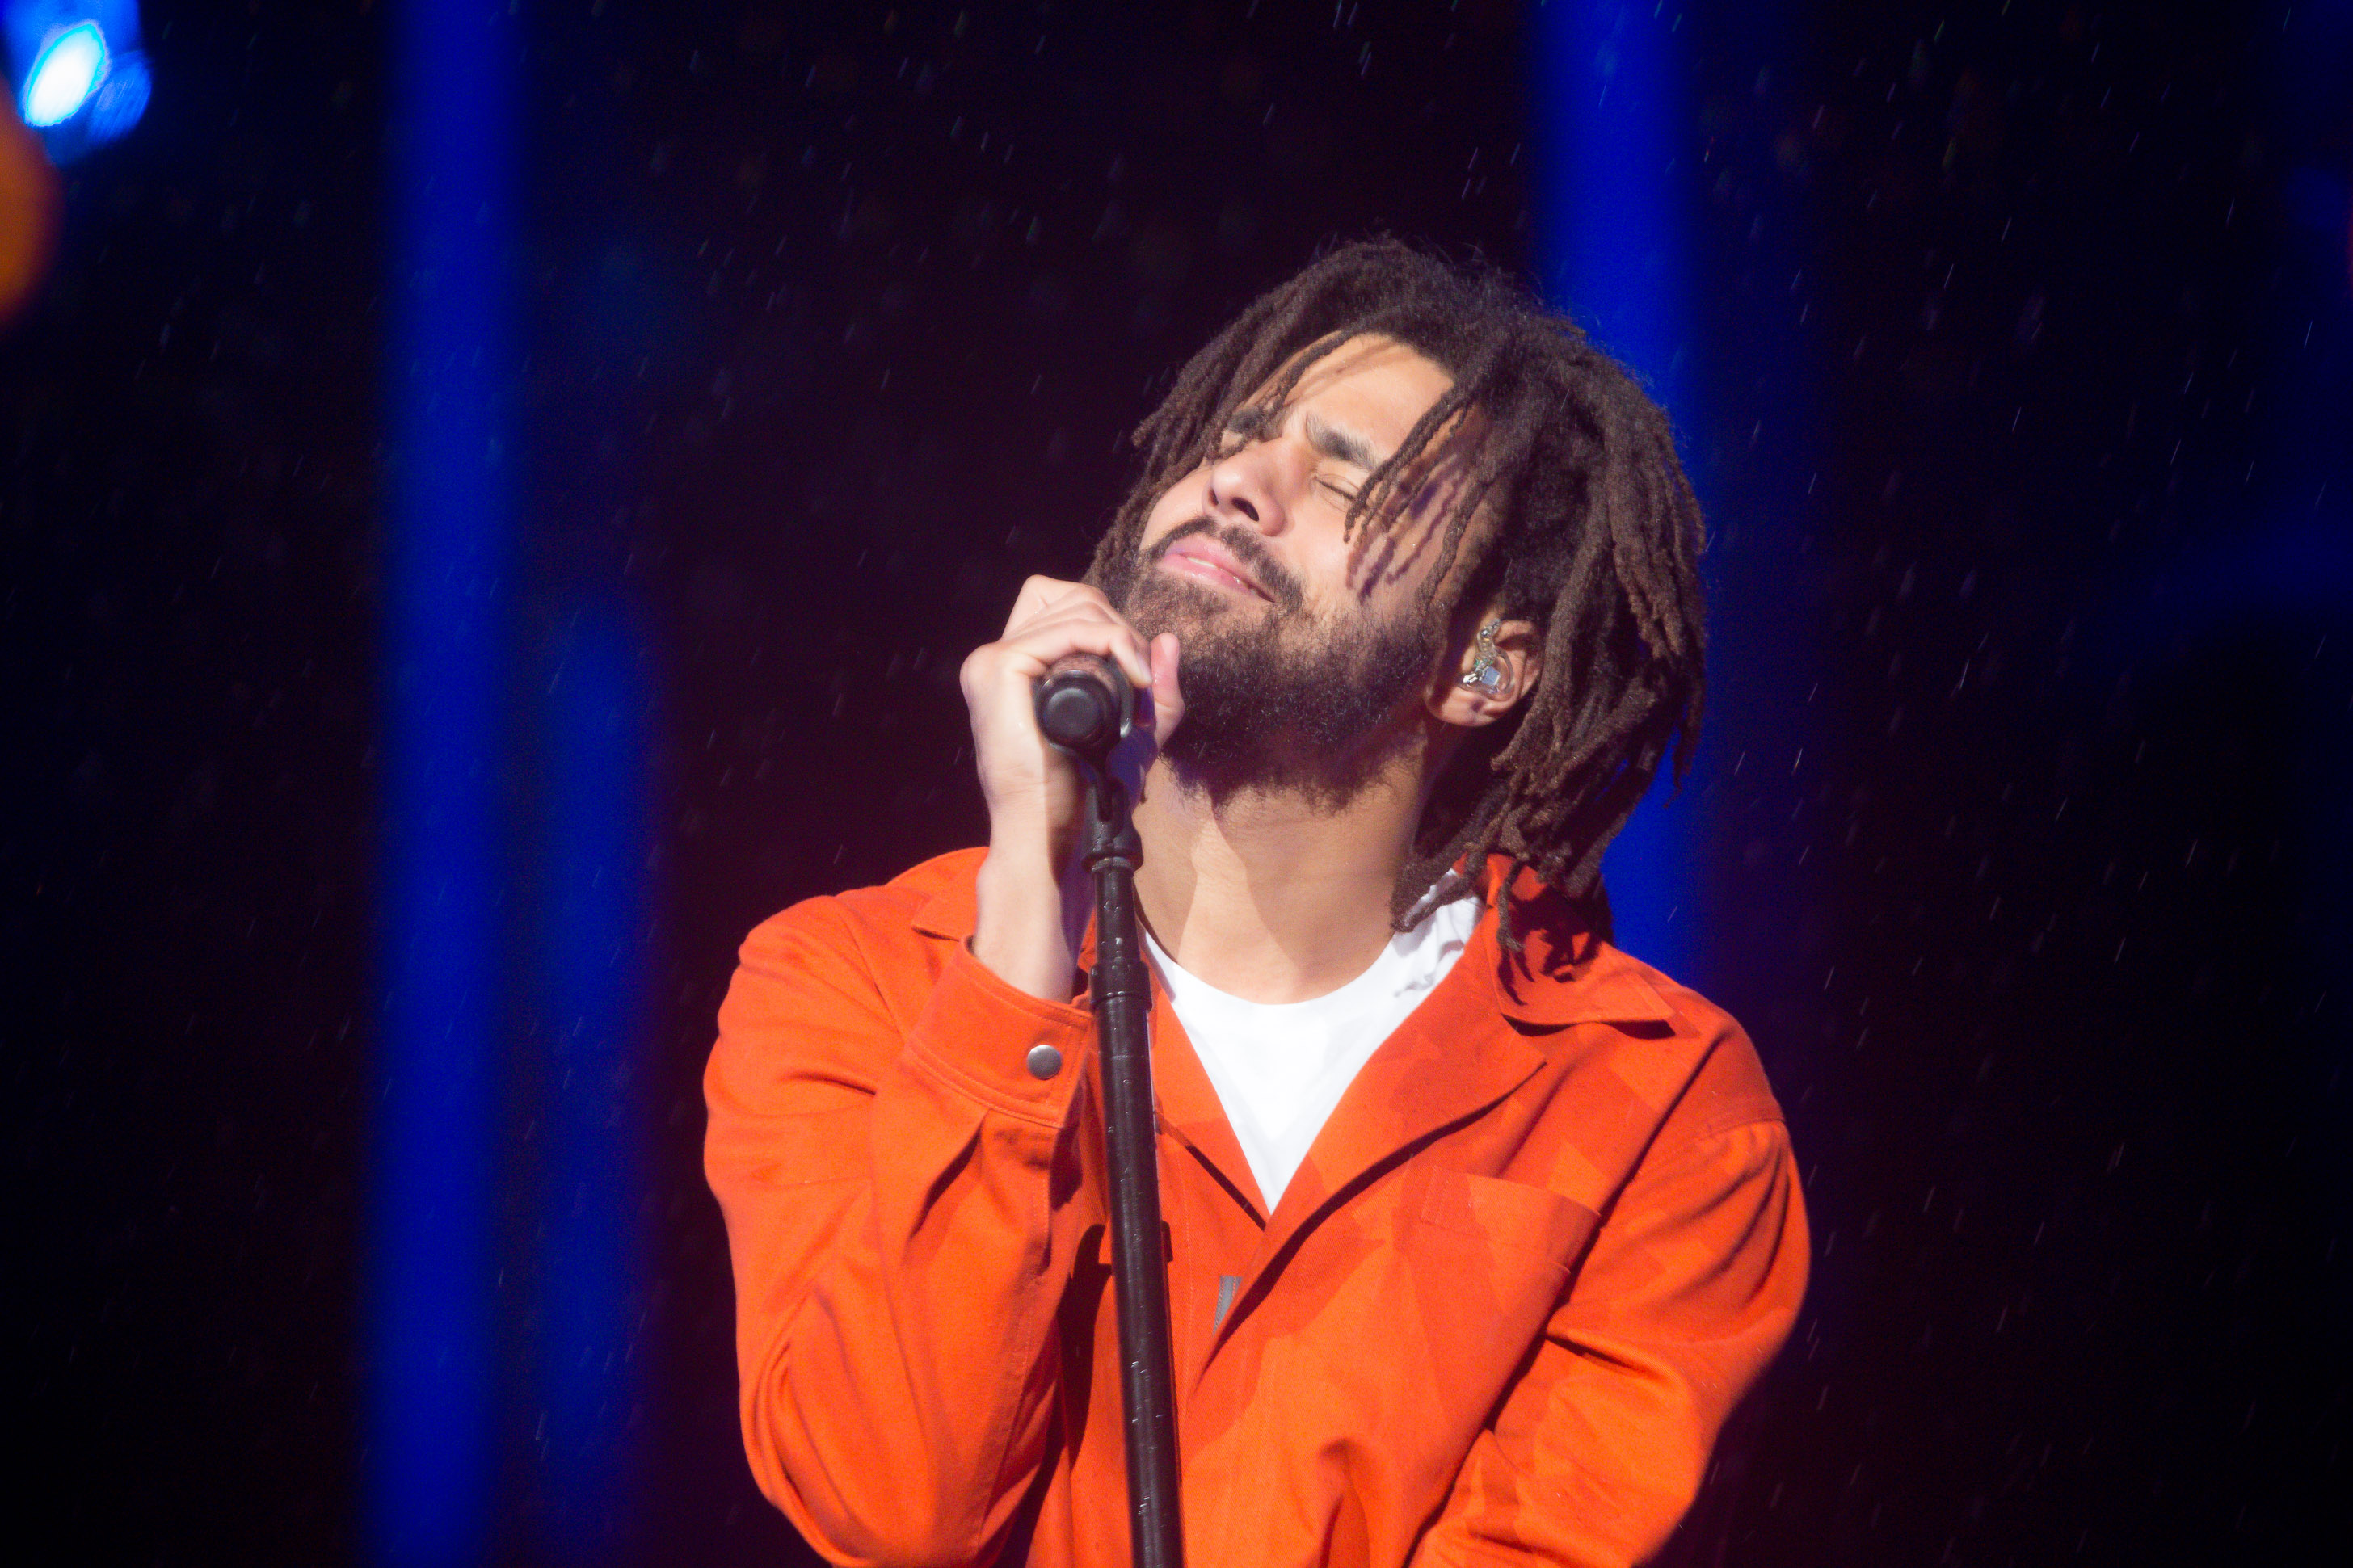 J. Cole Announces 'The Off-Season' Tour With 21 Savage